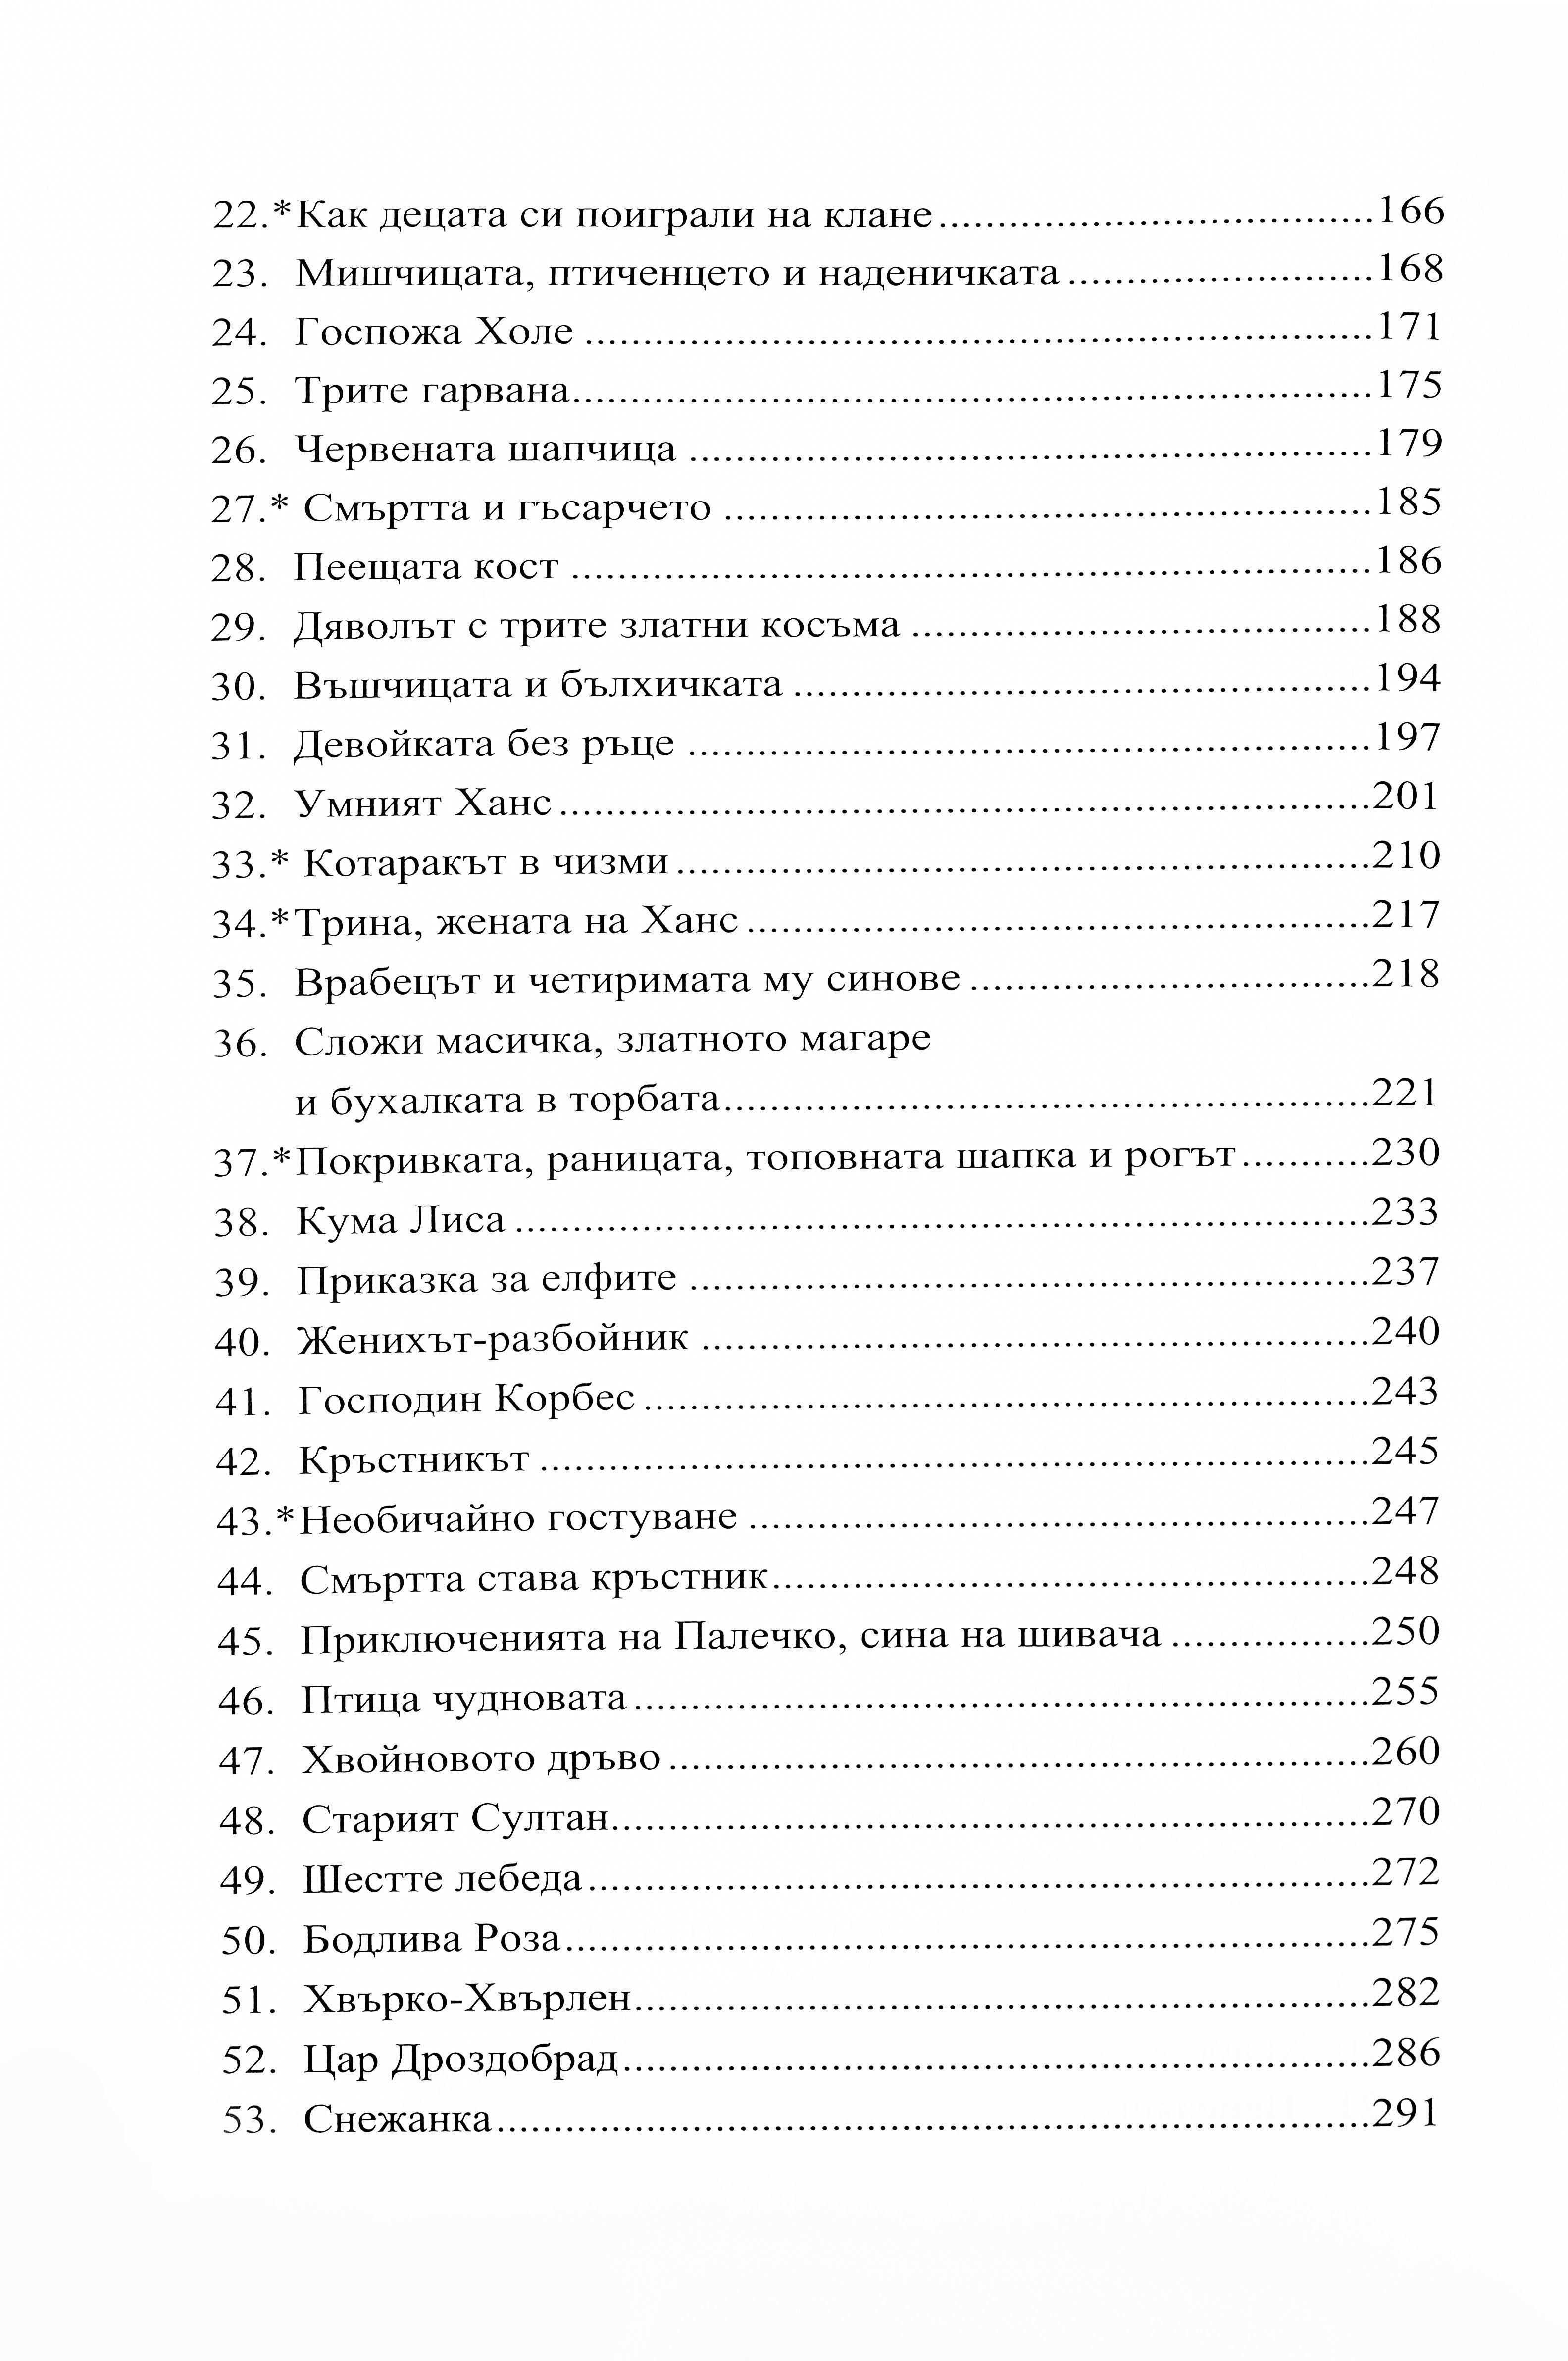 detski-i-domashni-prikazki-tvardi-koritsi-7 - 8